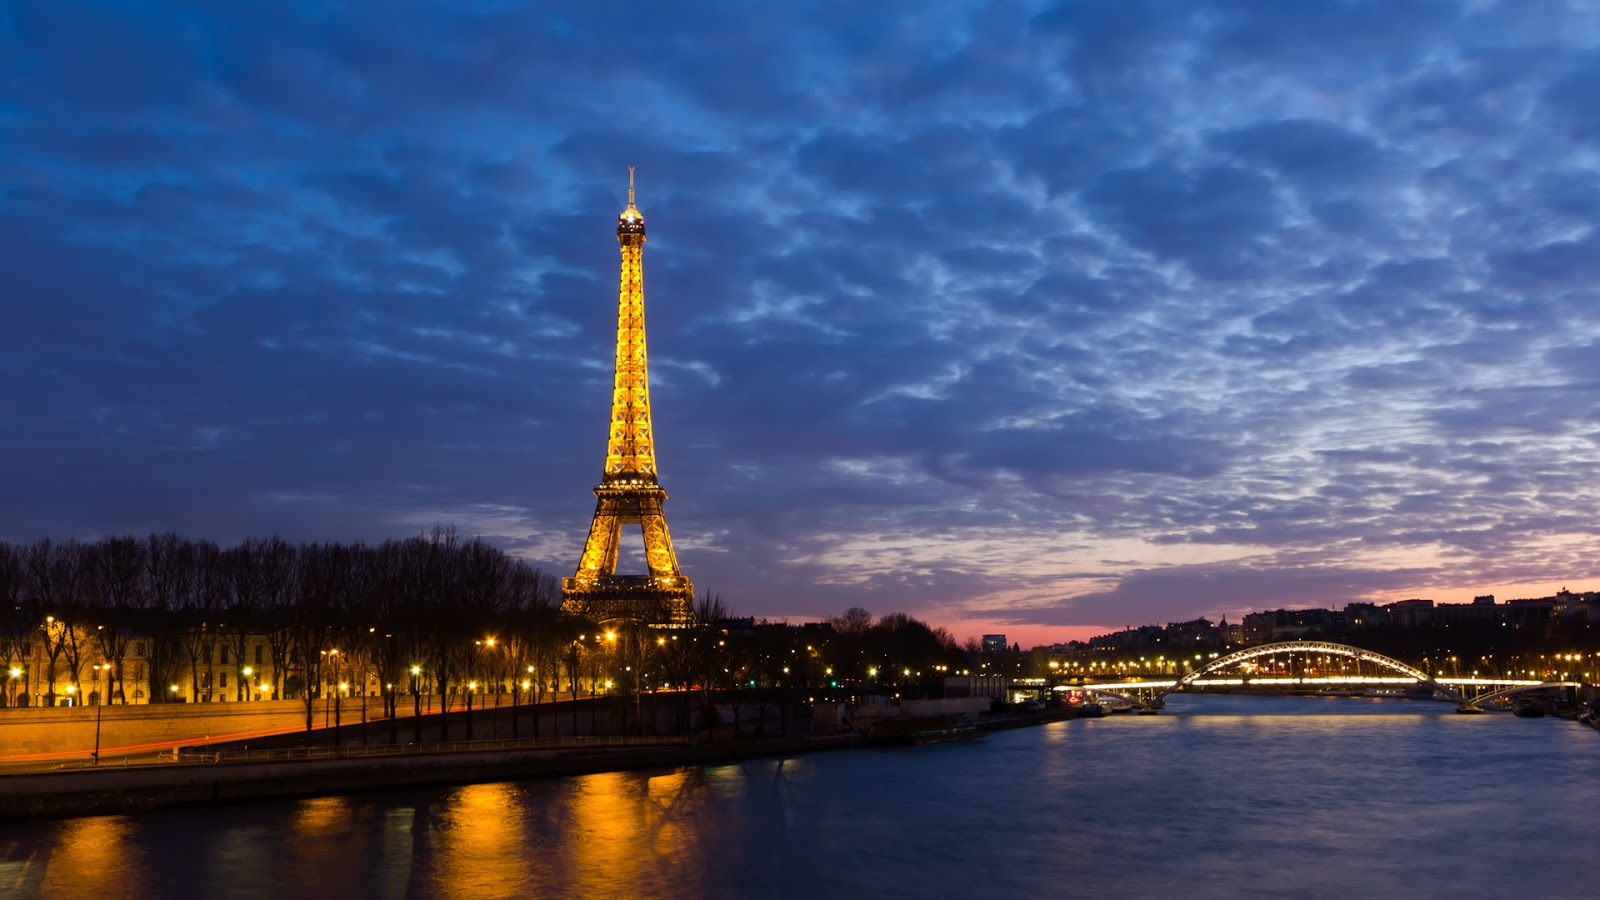 Paris at Night Wallpaper 1600x900